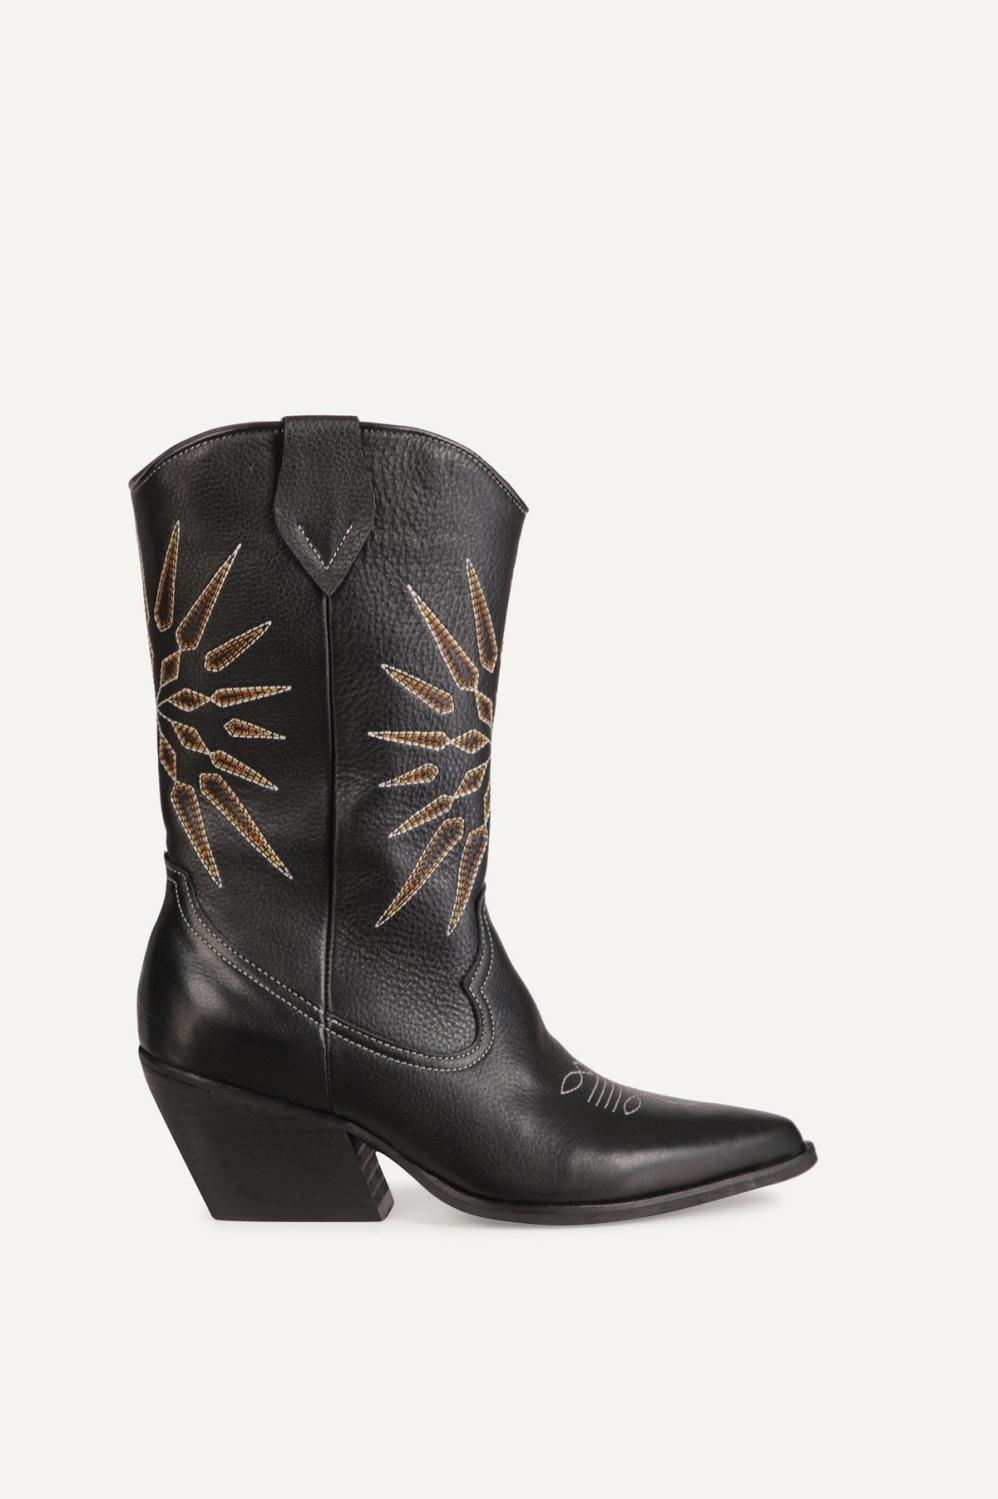 Shoecolate Cowboylaarzen Hak Zwart 8.20.08.090